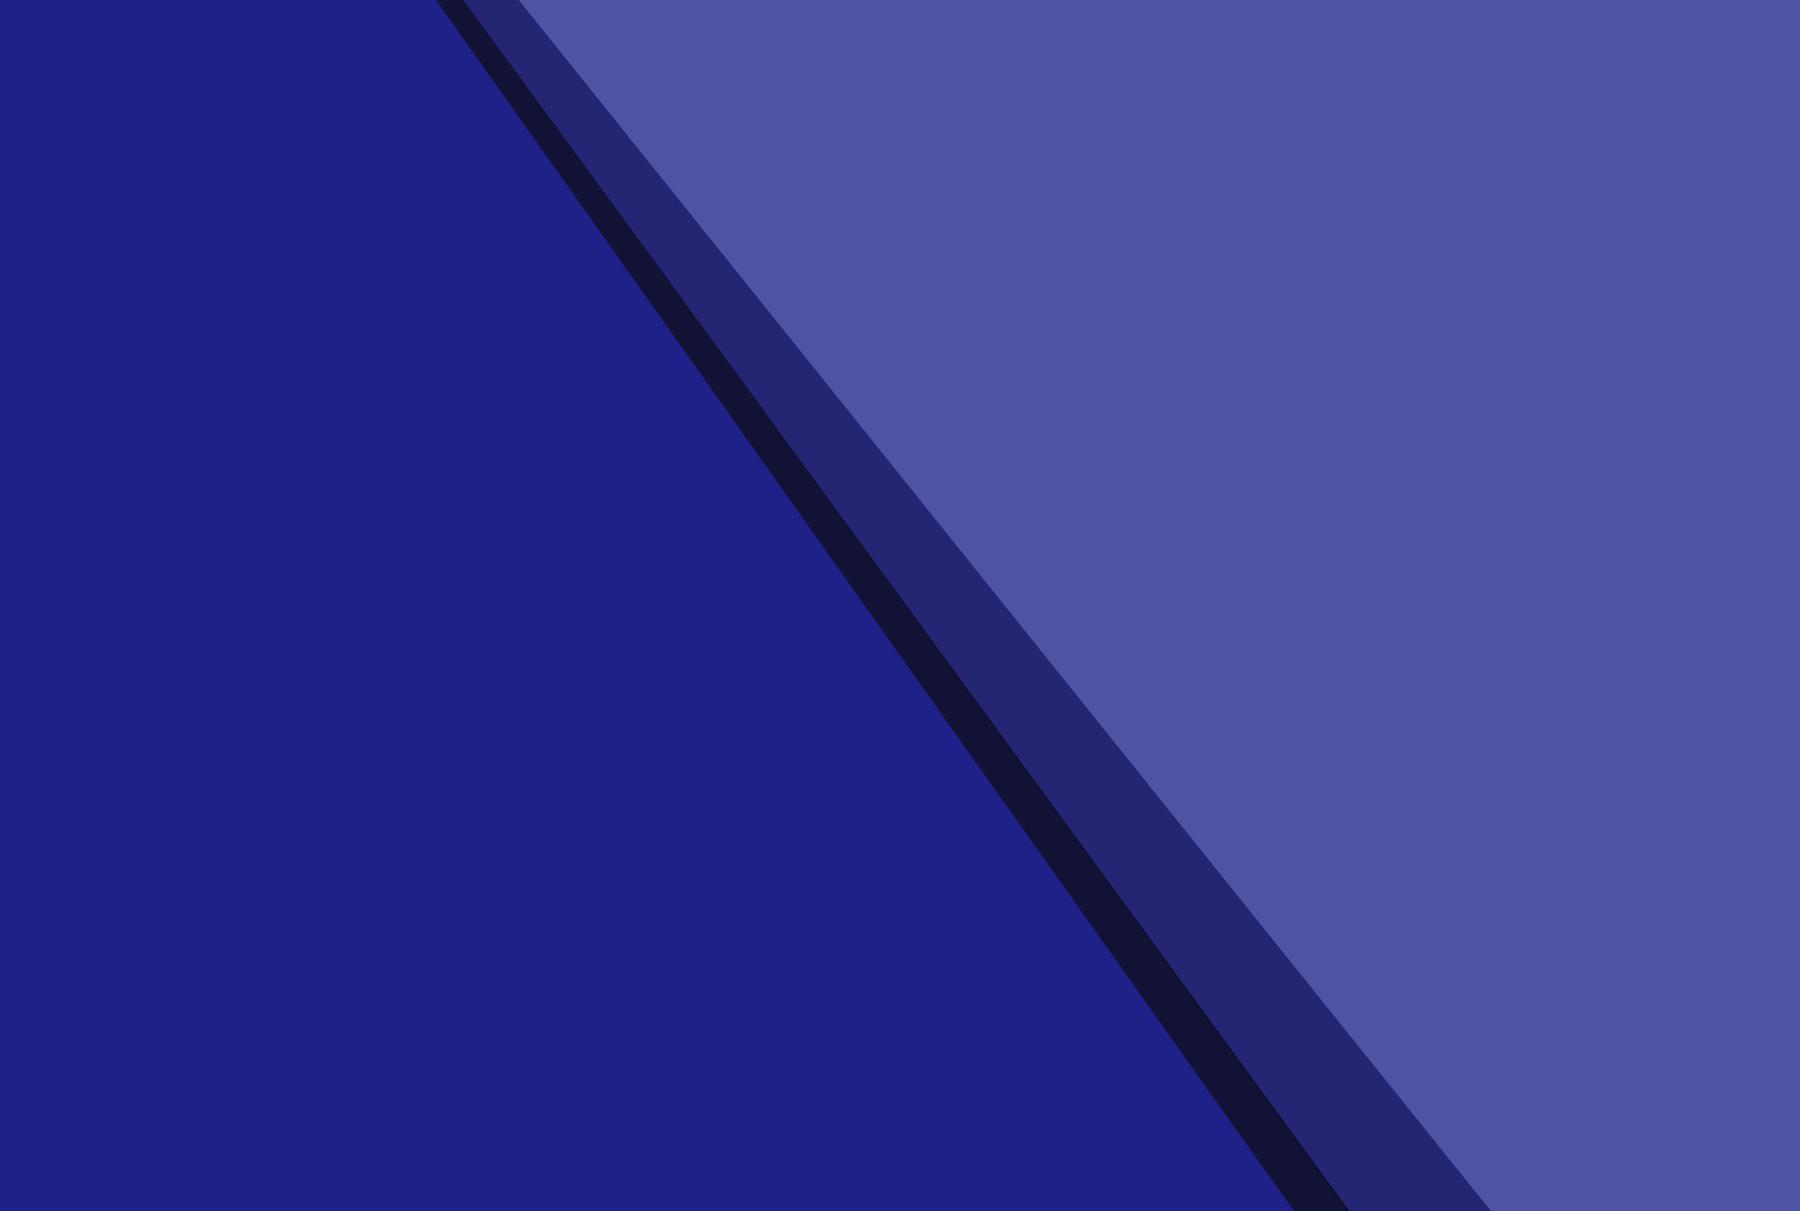 Purple coloured image overlay